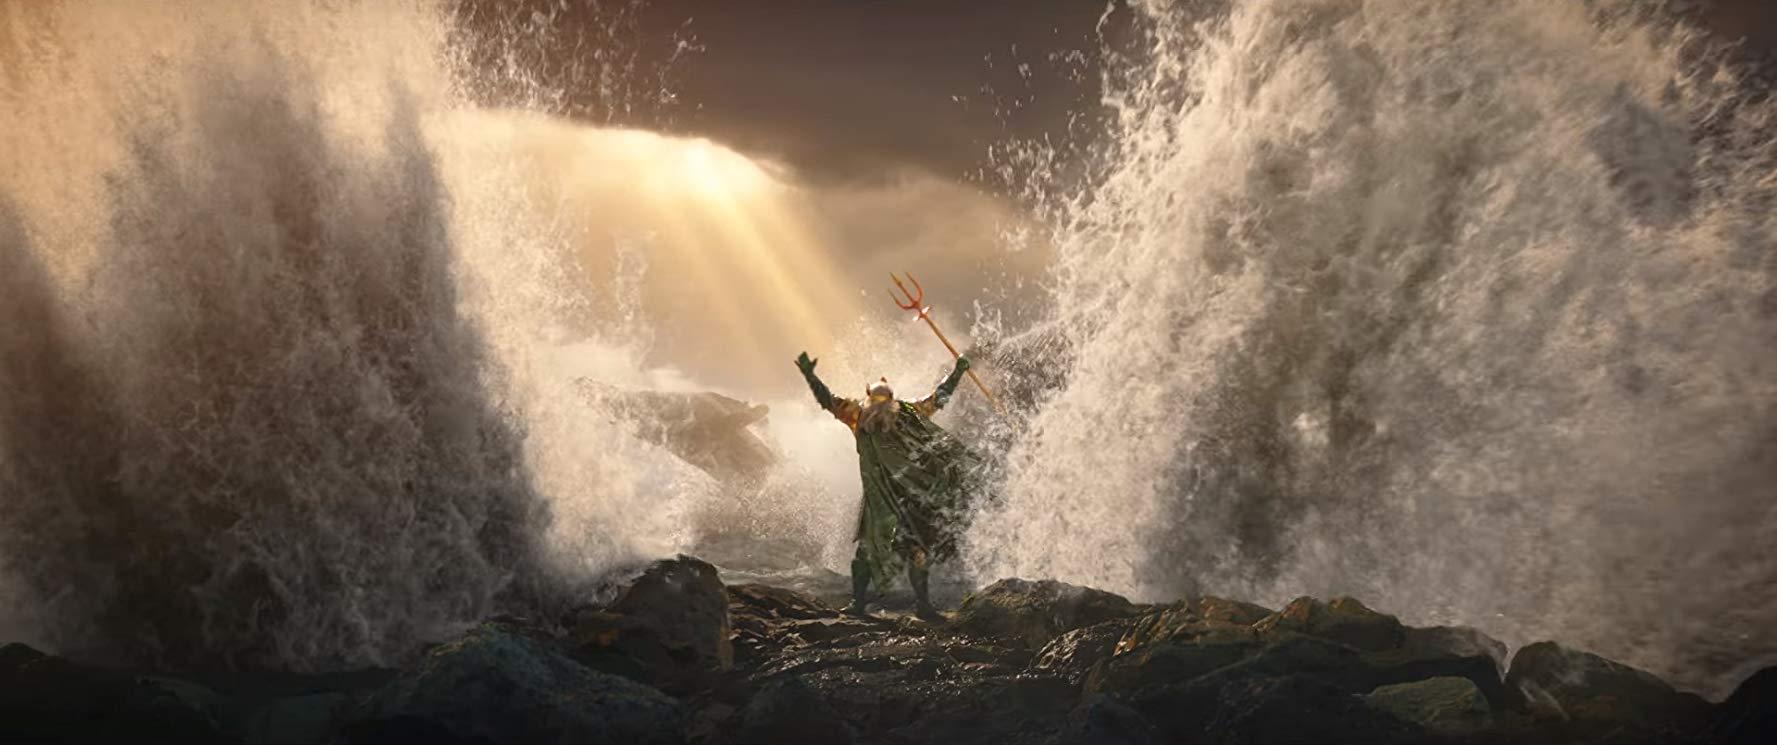 Aquaman (2018) Review